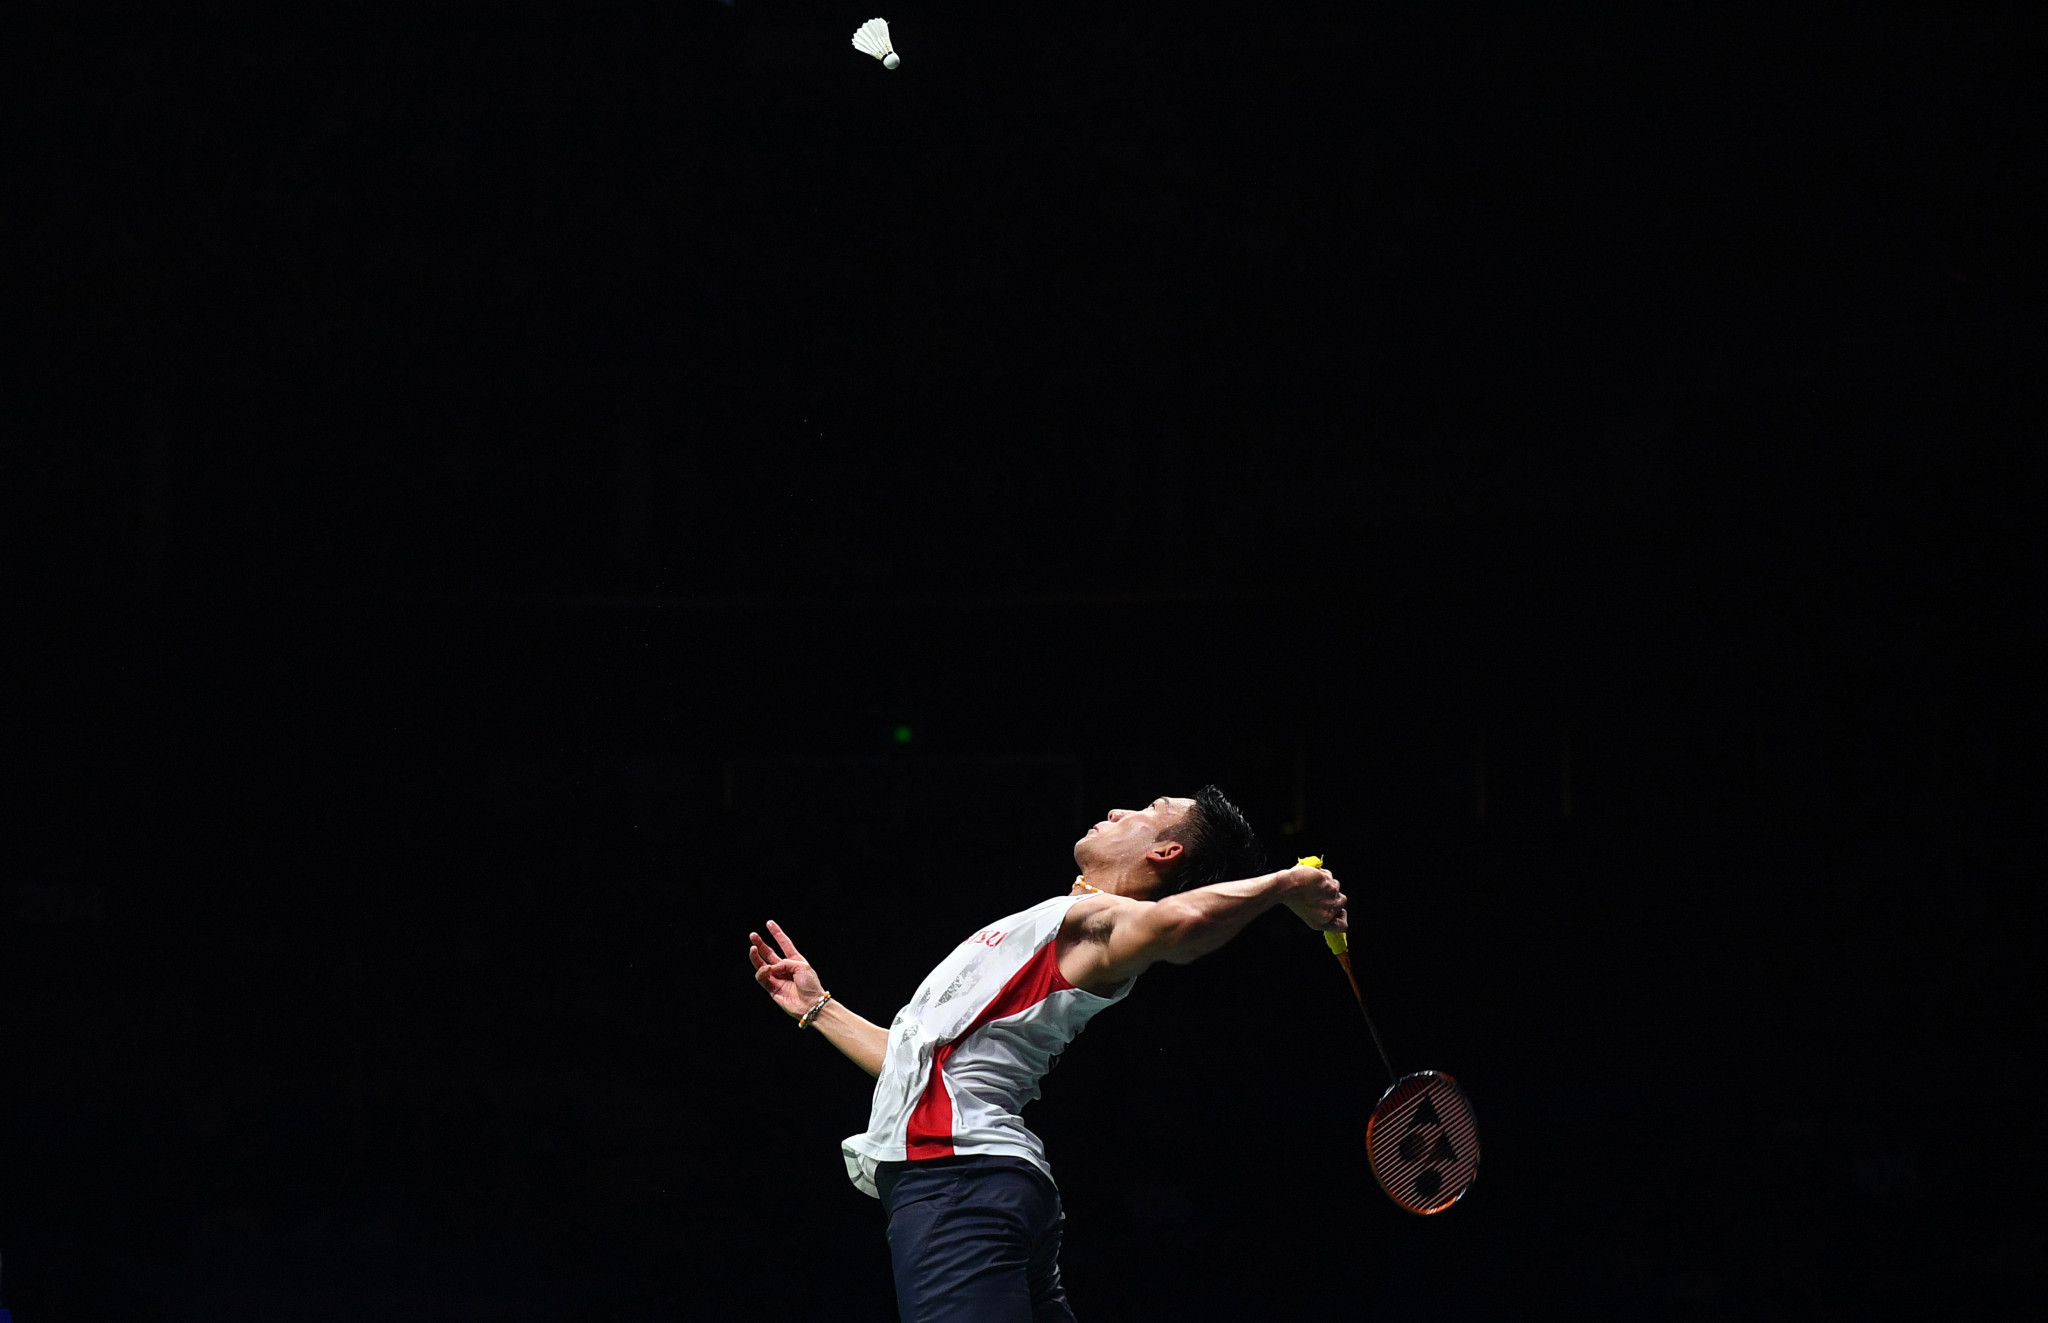 GoDaddy sponsored last year's BWF World Championships ©Getty Images